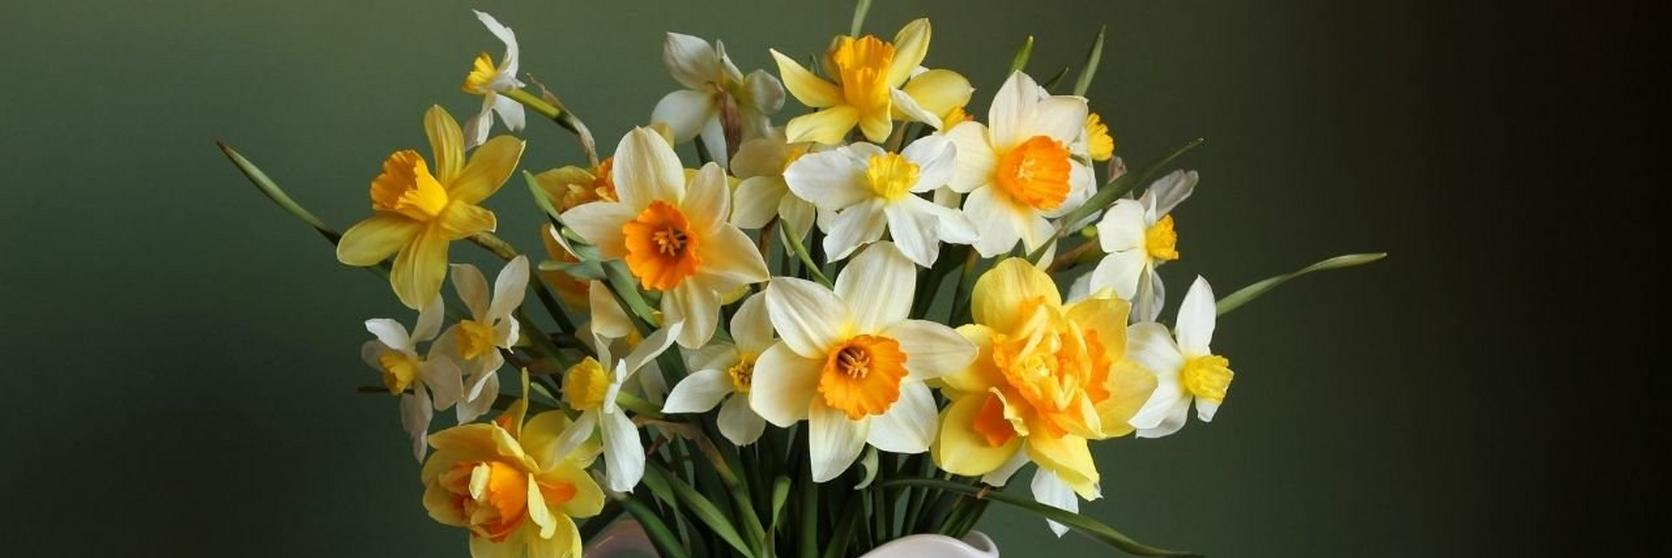 jug_of_daffodils